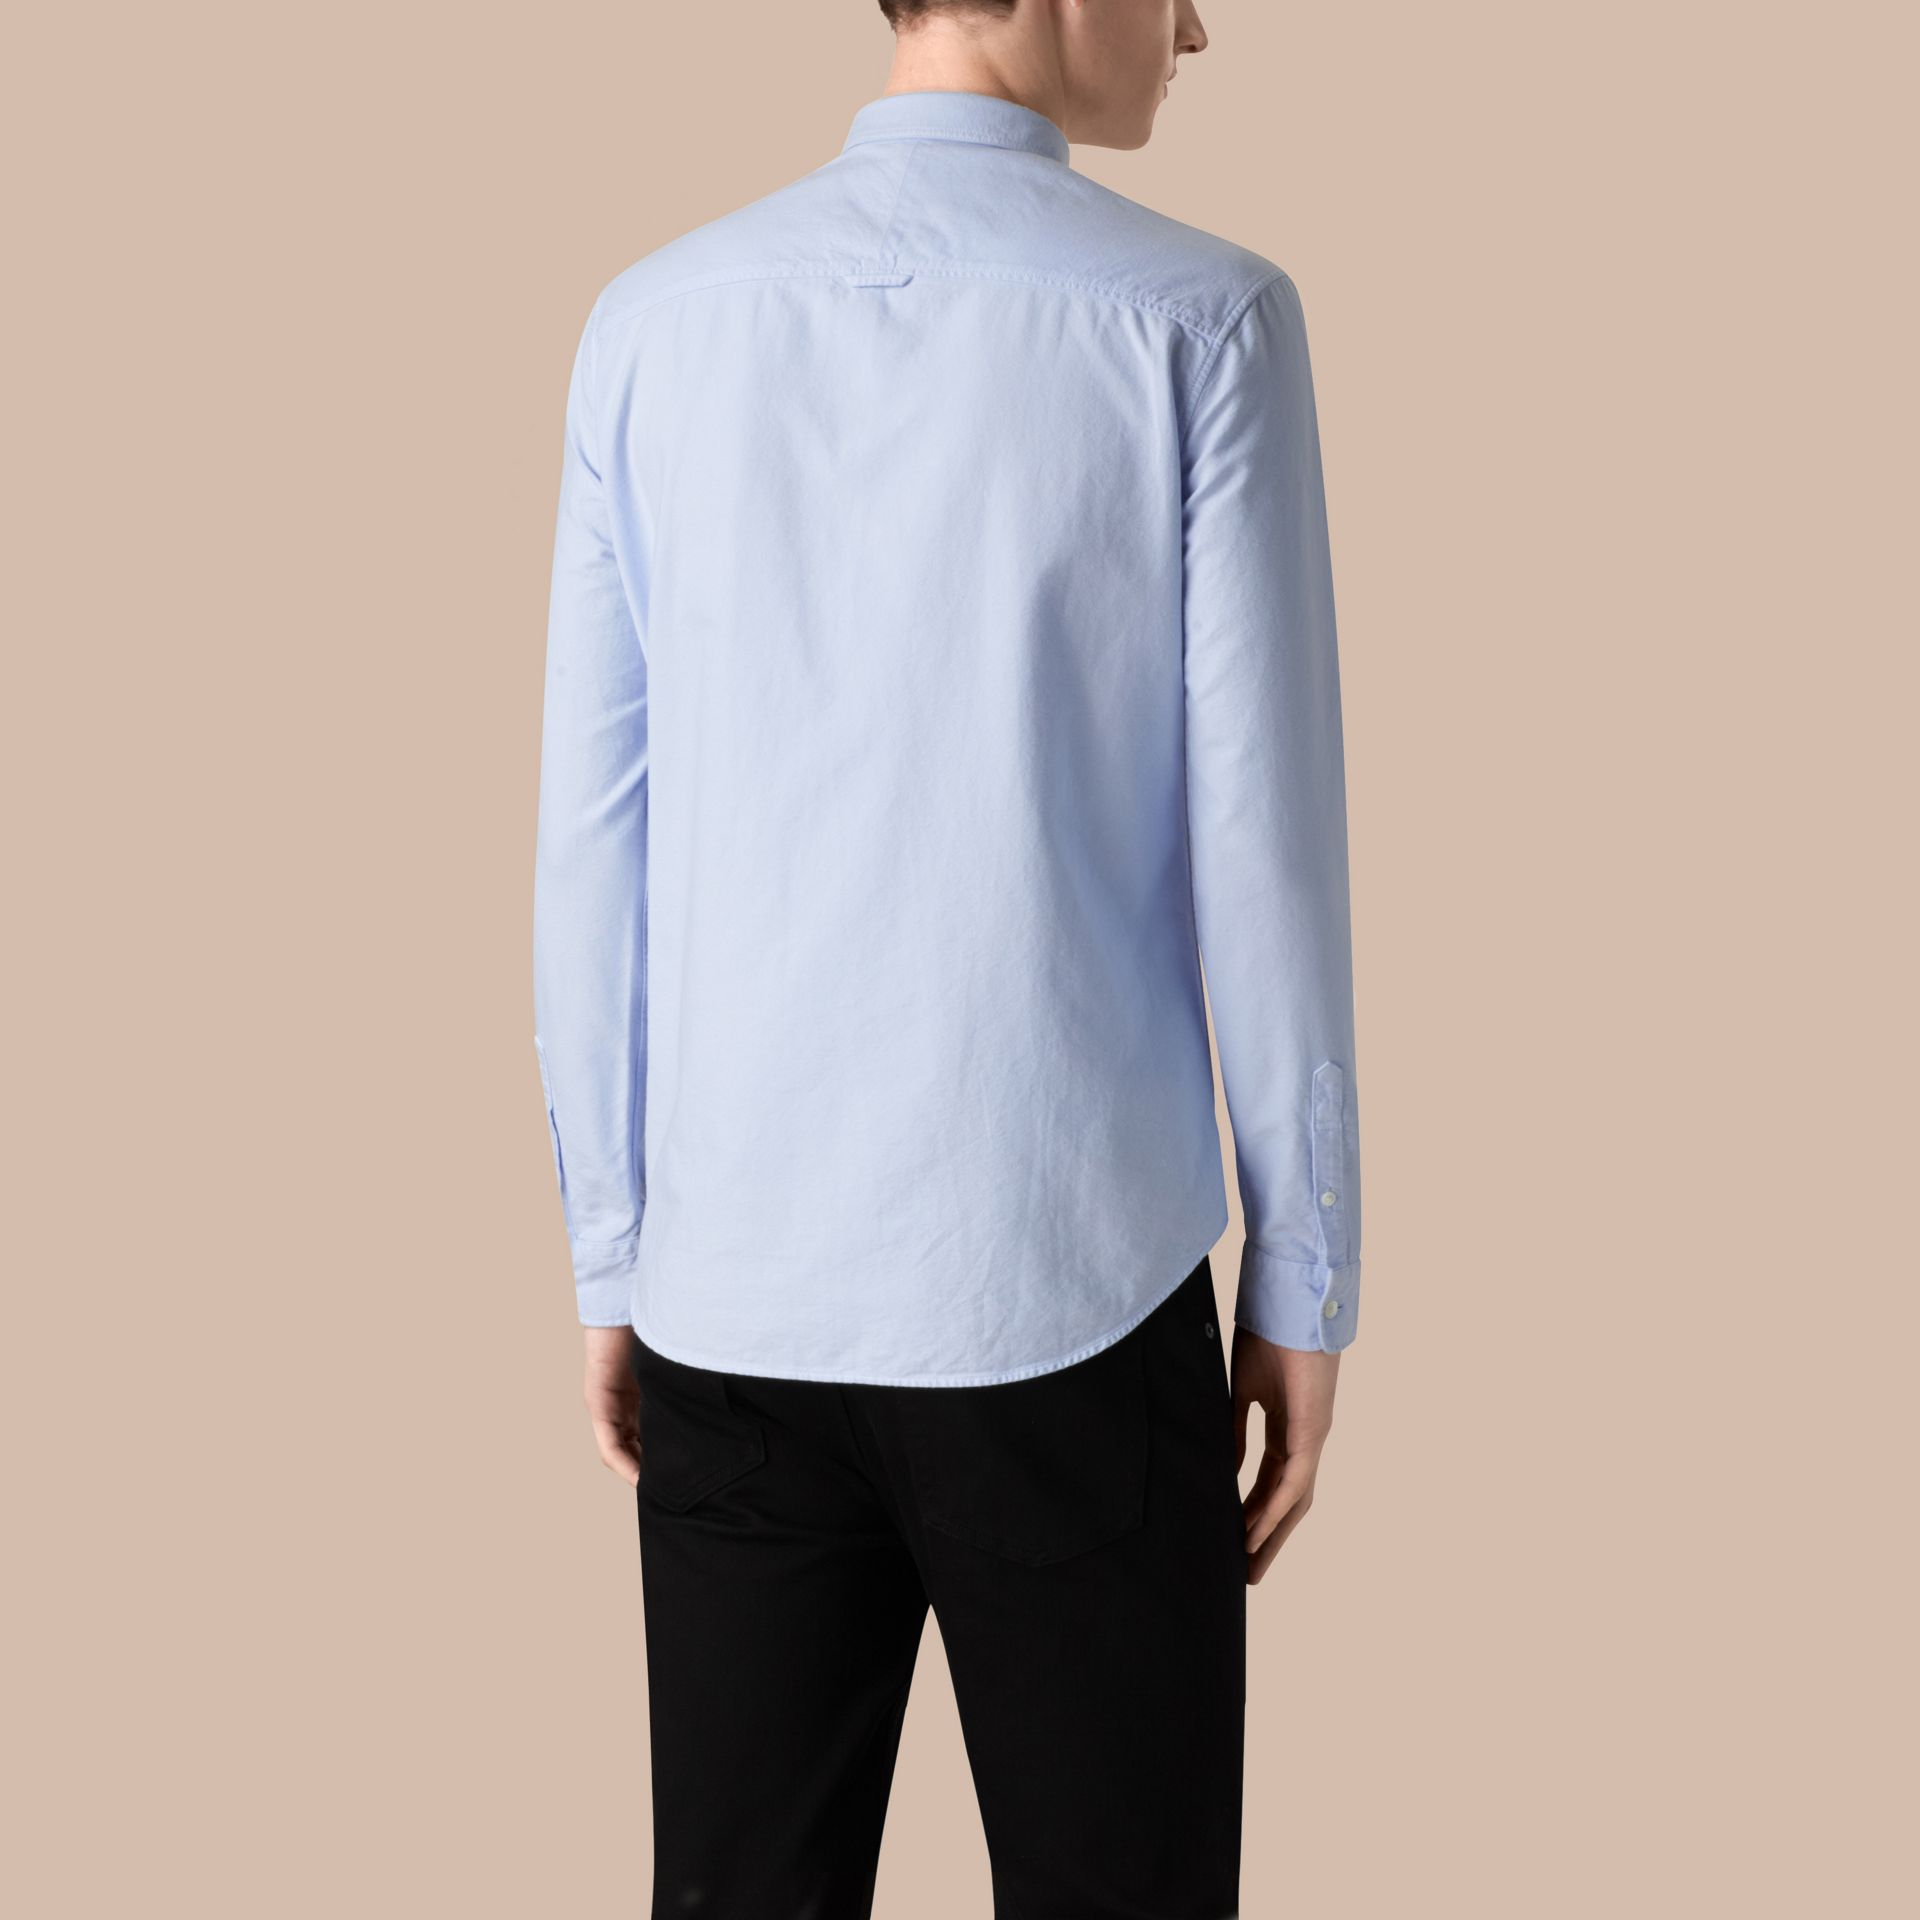 Hellblau Oxford-Hemd aus Baumwolle Hellblau - Galerie-Bild 3